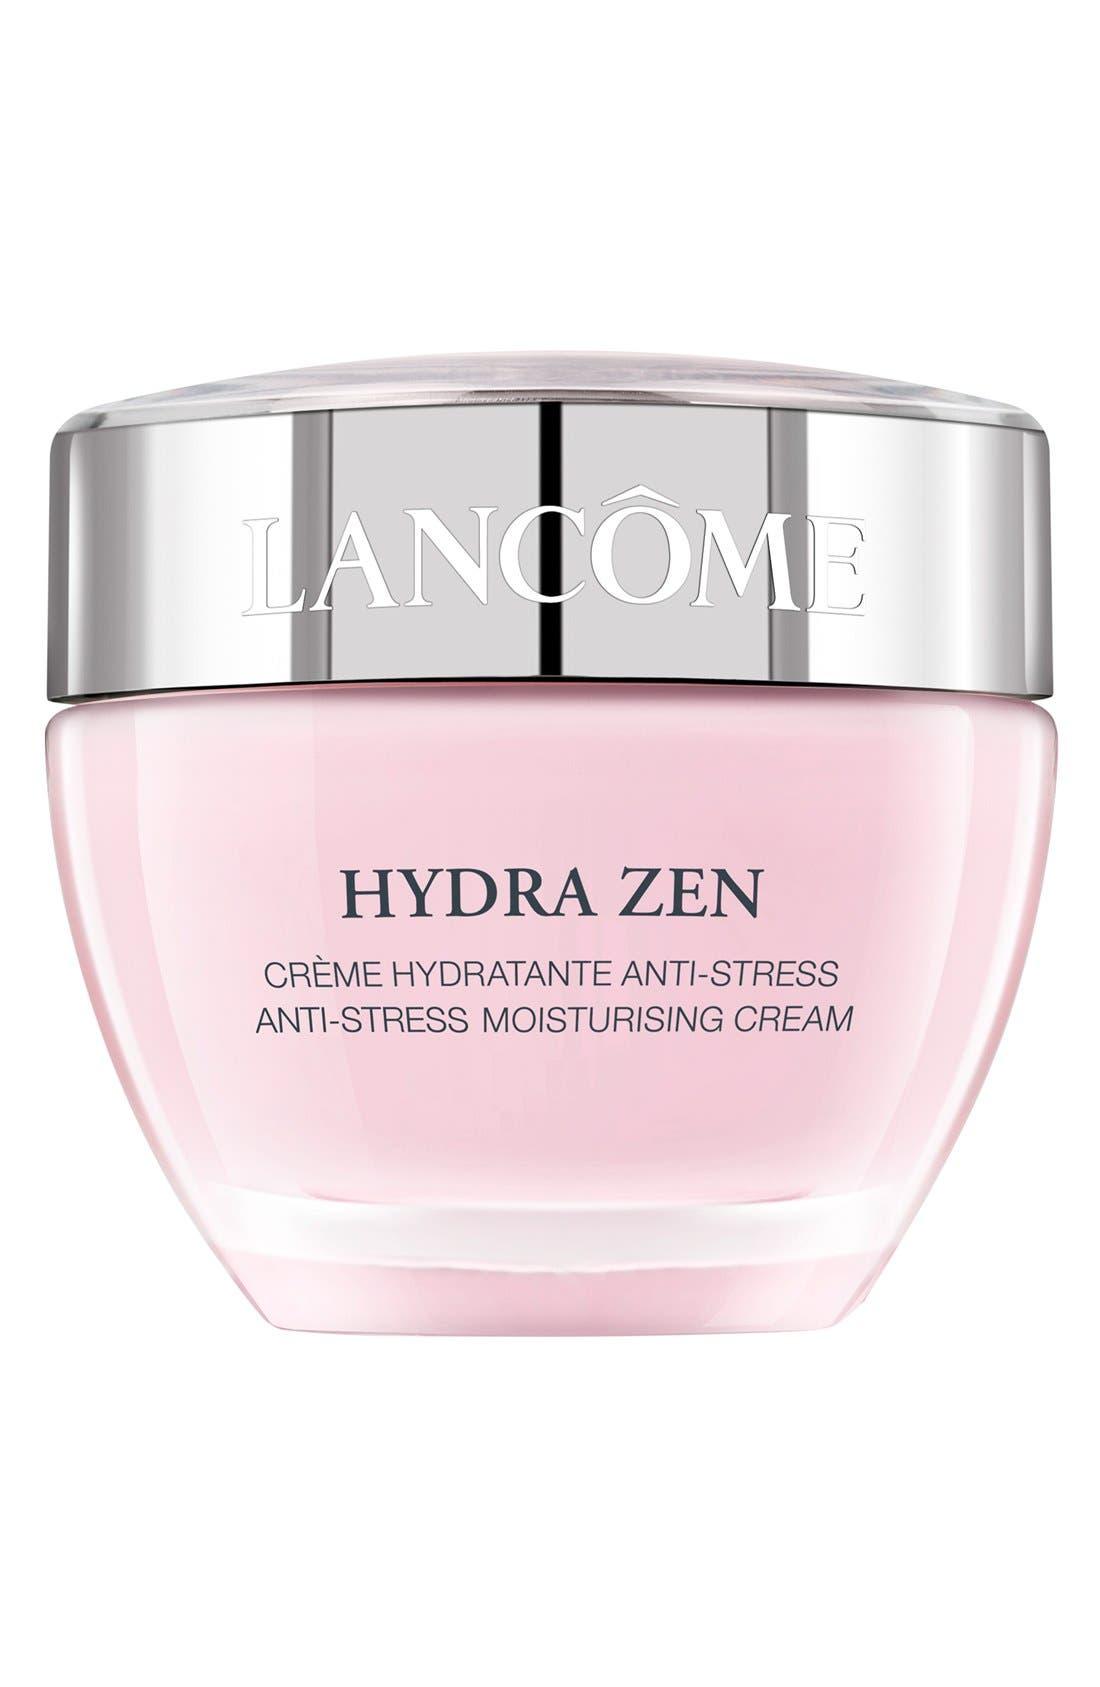 Hydra Zen Anti-Stress Moisturizing Cream,                             Main thumbnail 1, color,                             NO COLOR